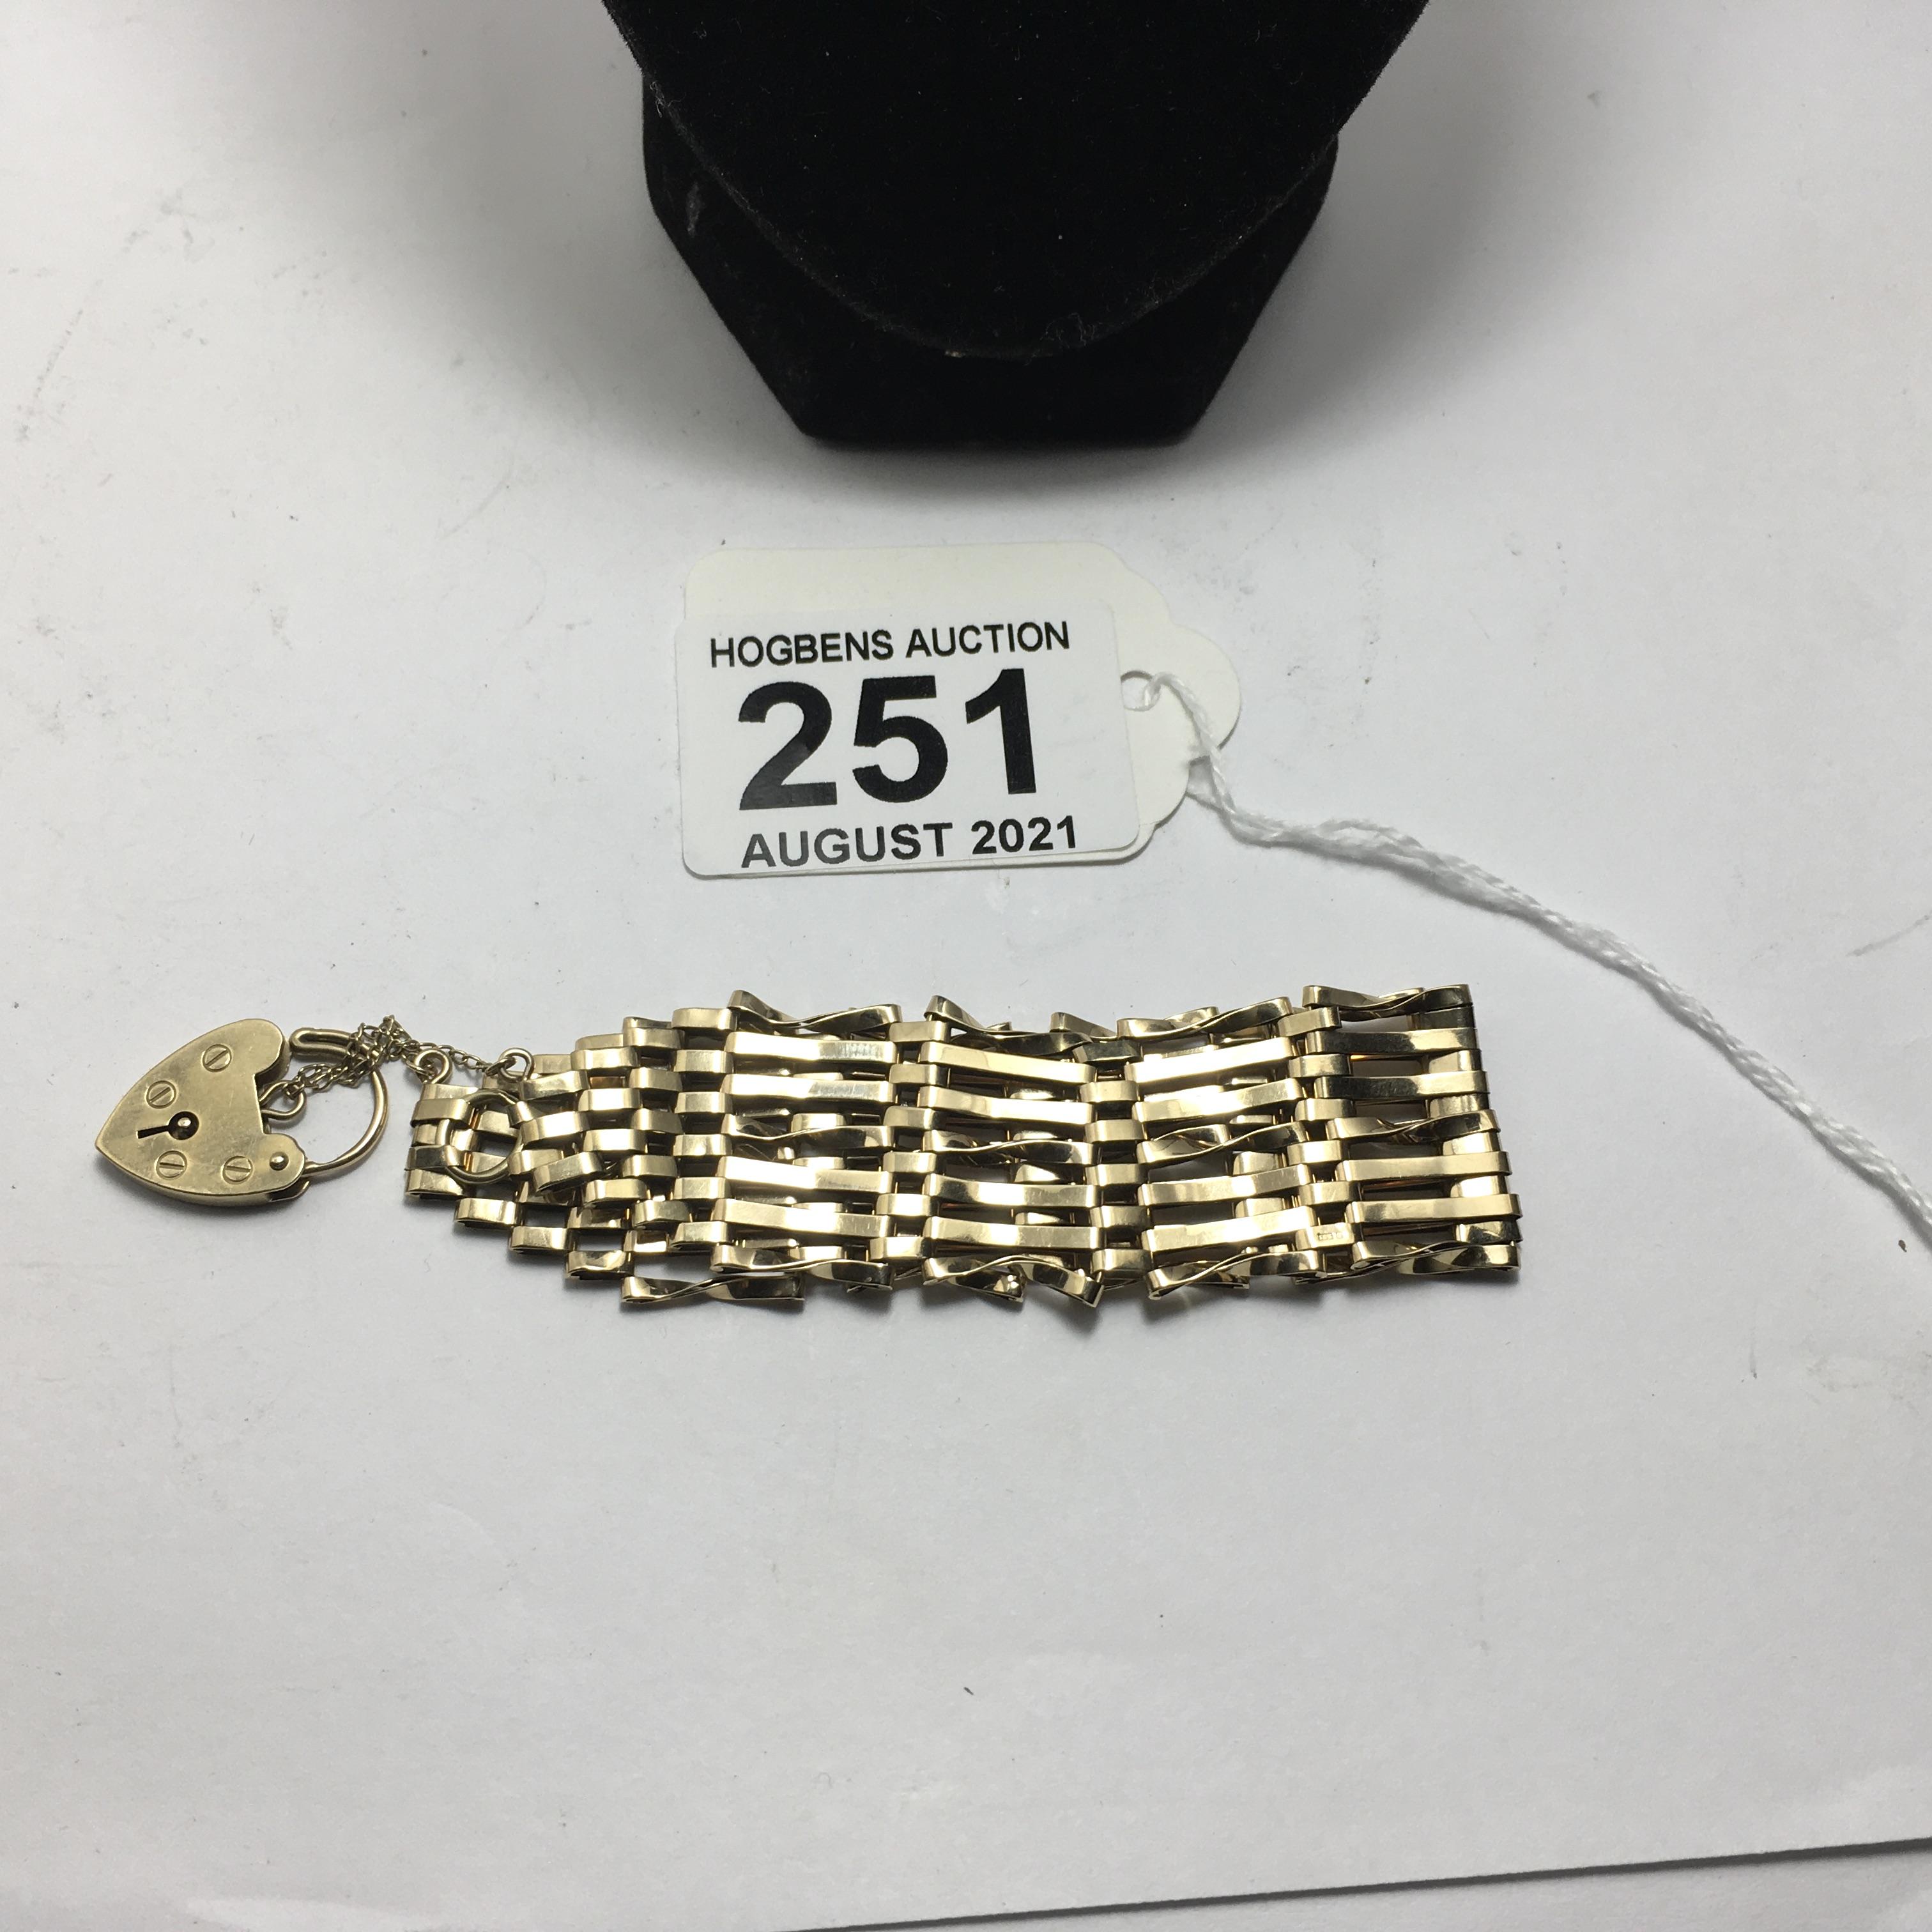 9ct gold ladies gate bracelet, 11 grams - Image 4 of 4